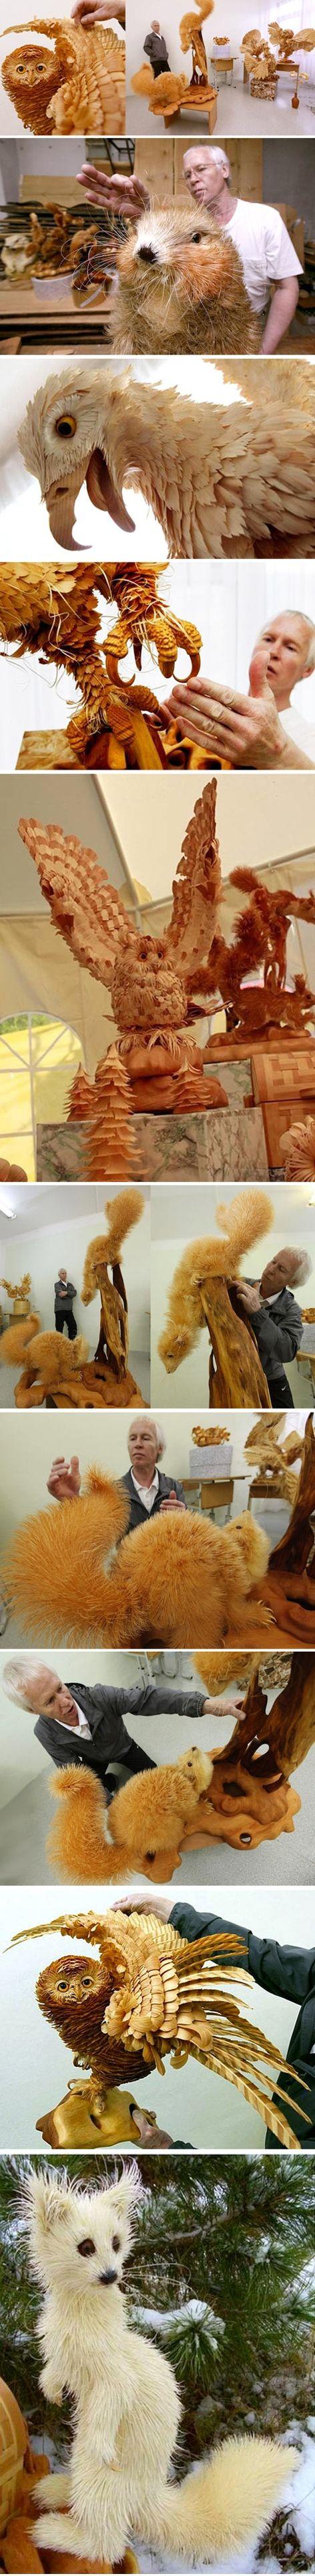 wood shaving animals... - (sculptures) - #woodshavings #wood #shavings #animals #sculptuers